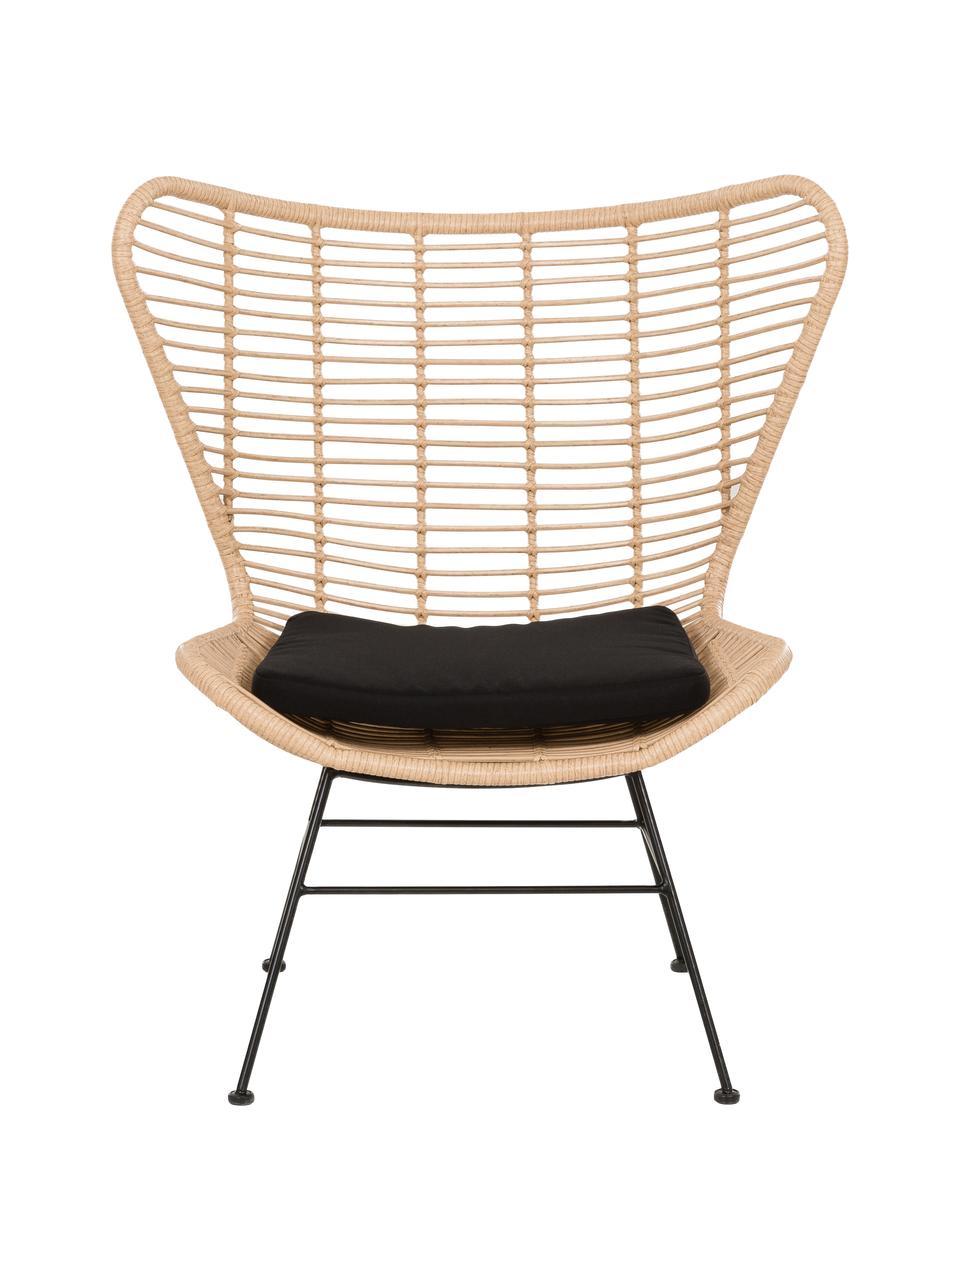 Polyrattan-Ohrensessel Costa in Hellbraun, Sitzfläche: Polyethylen-Geflecht, Gestell: Metall, pulverbeschichtet, Hellbraun, Schwarz, B 90 x T 89 cm